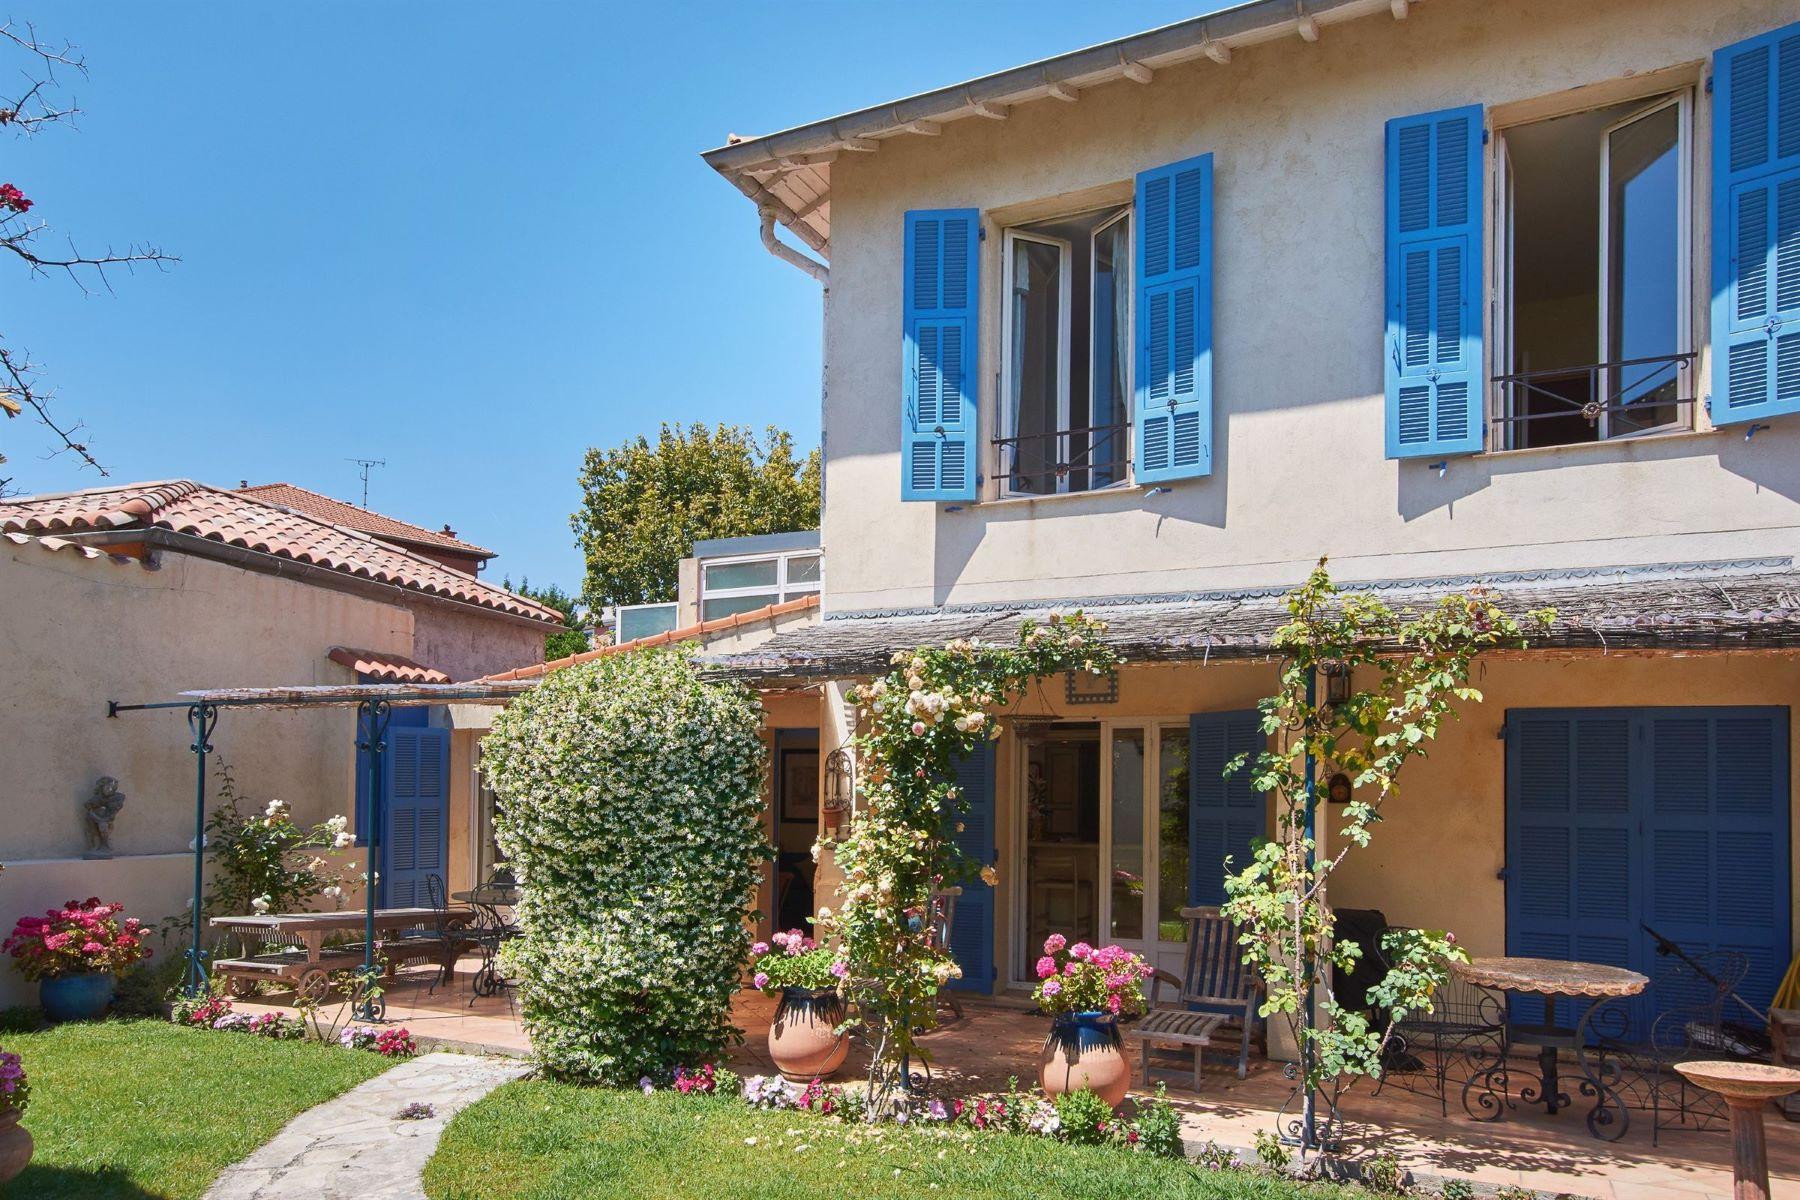 "Single Family Homes for Sale at Charming ""Cottage style "" House in the heart of St Jean Cap Ferrat Saint Jean Cap Ferrat, Provence-Alpes-Cote D'Azur 06230 France"